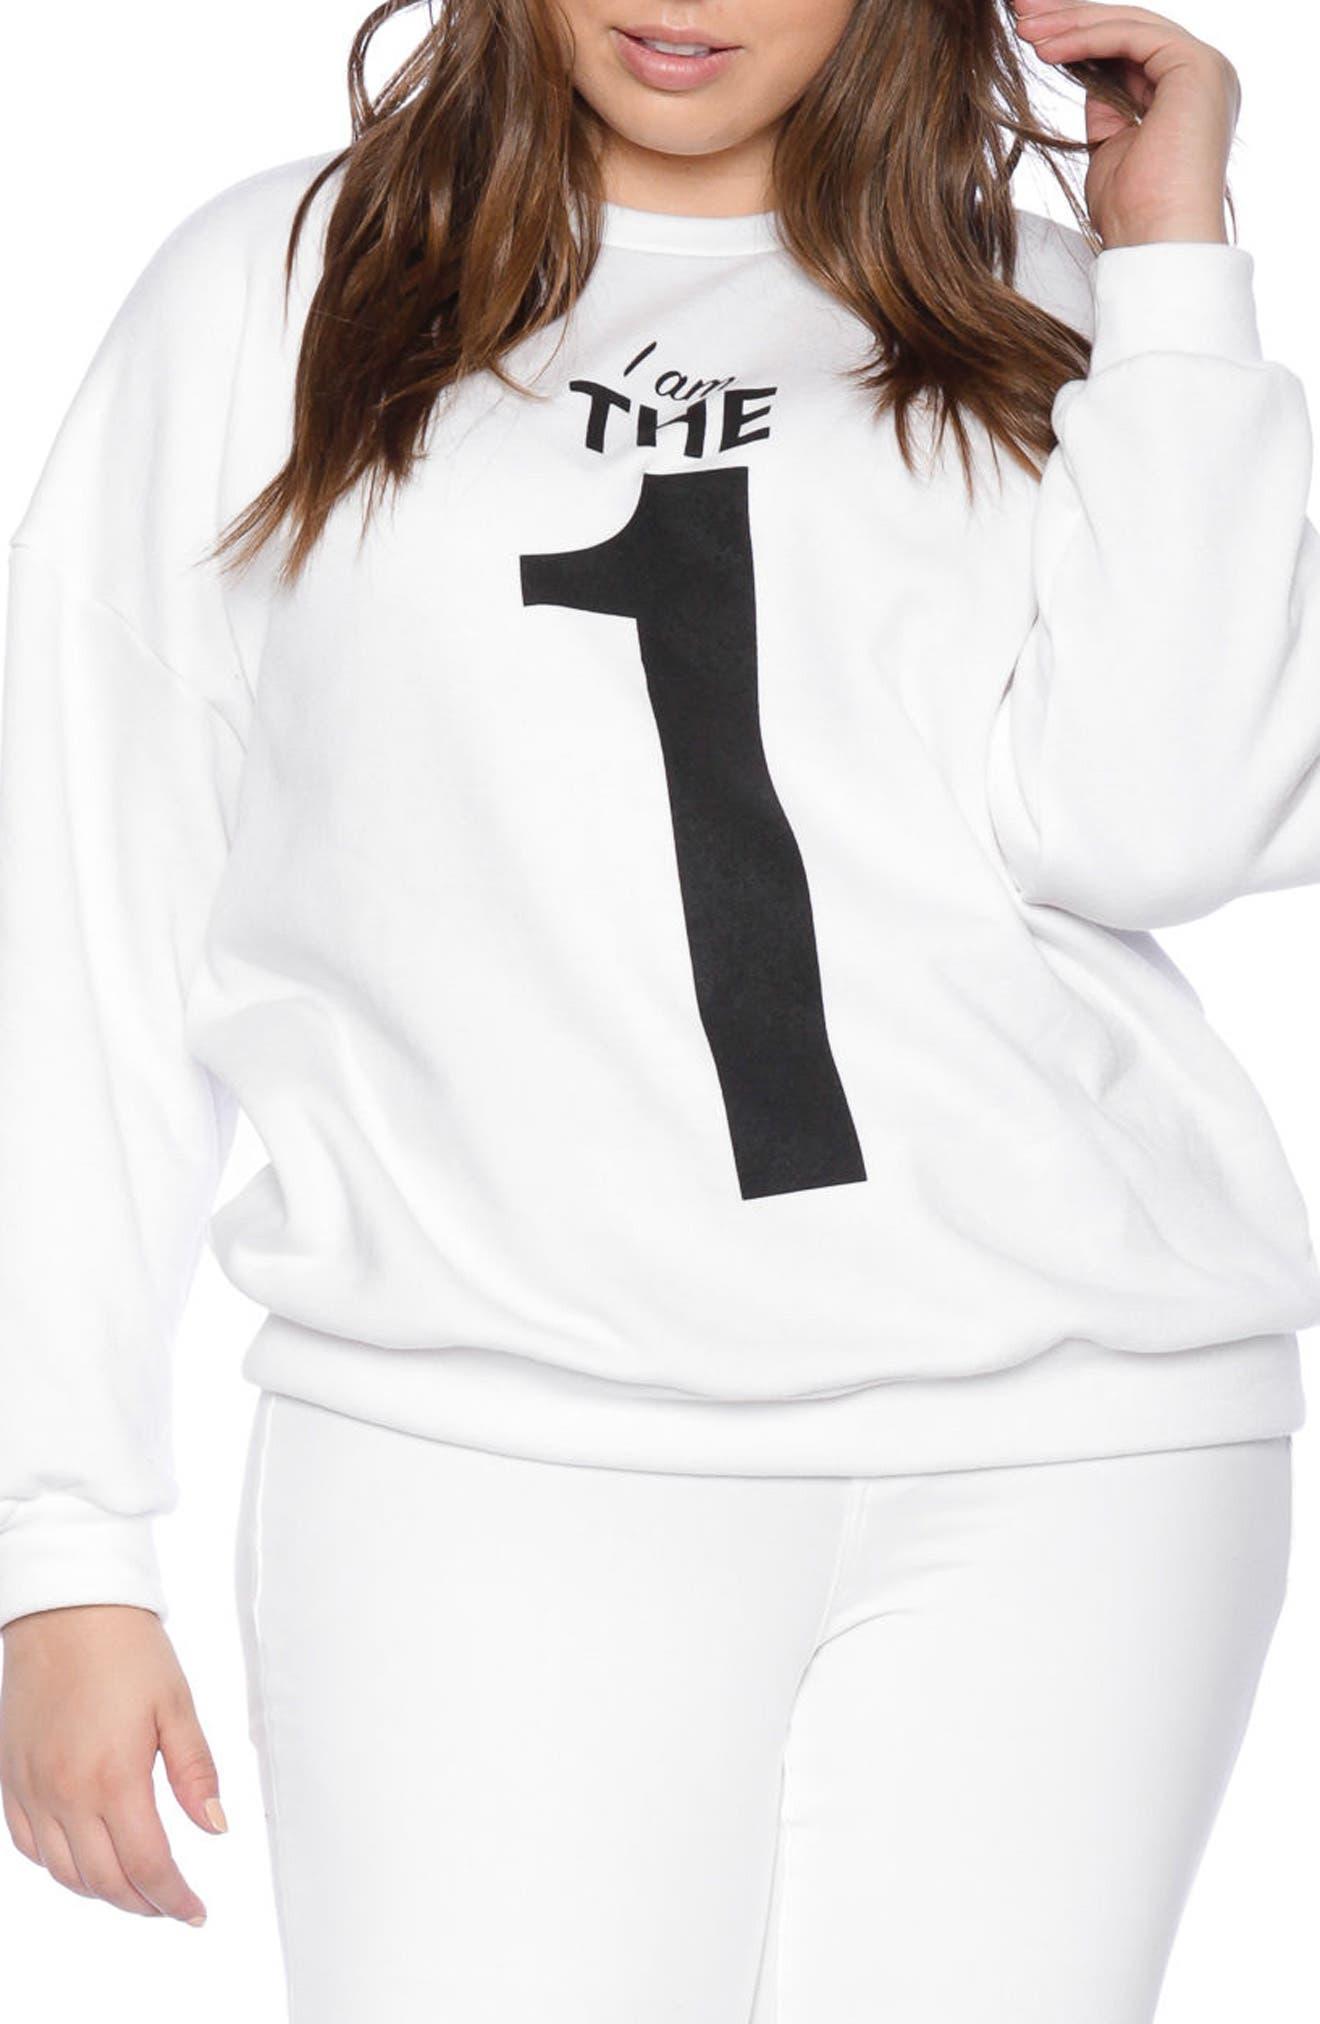 I Am the One Oversize Sweatshirt,                             Main thumbnail 1, color,                             White